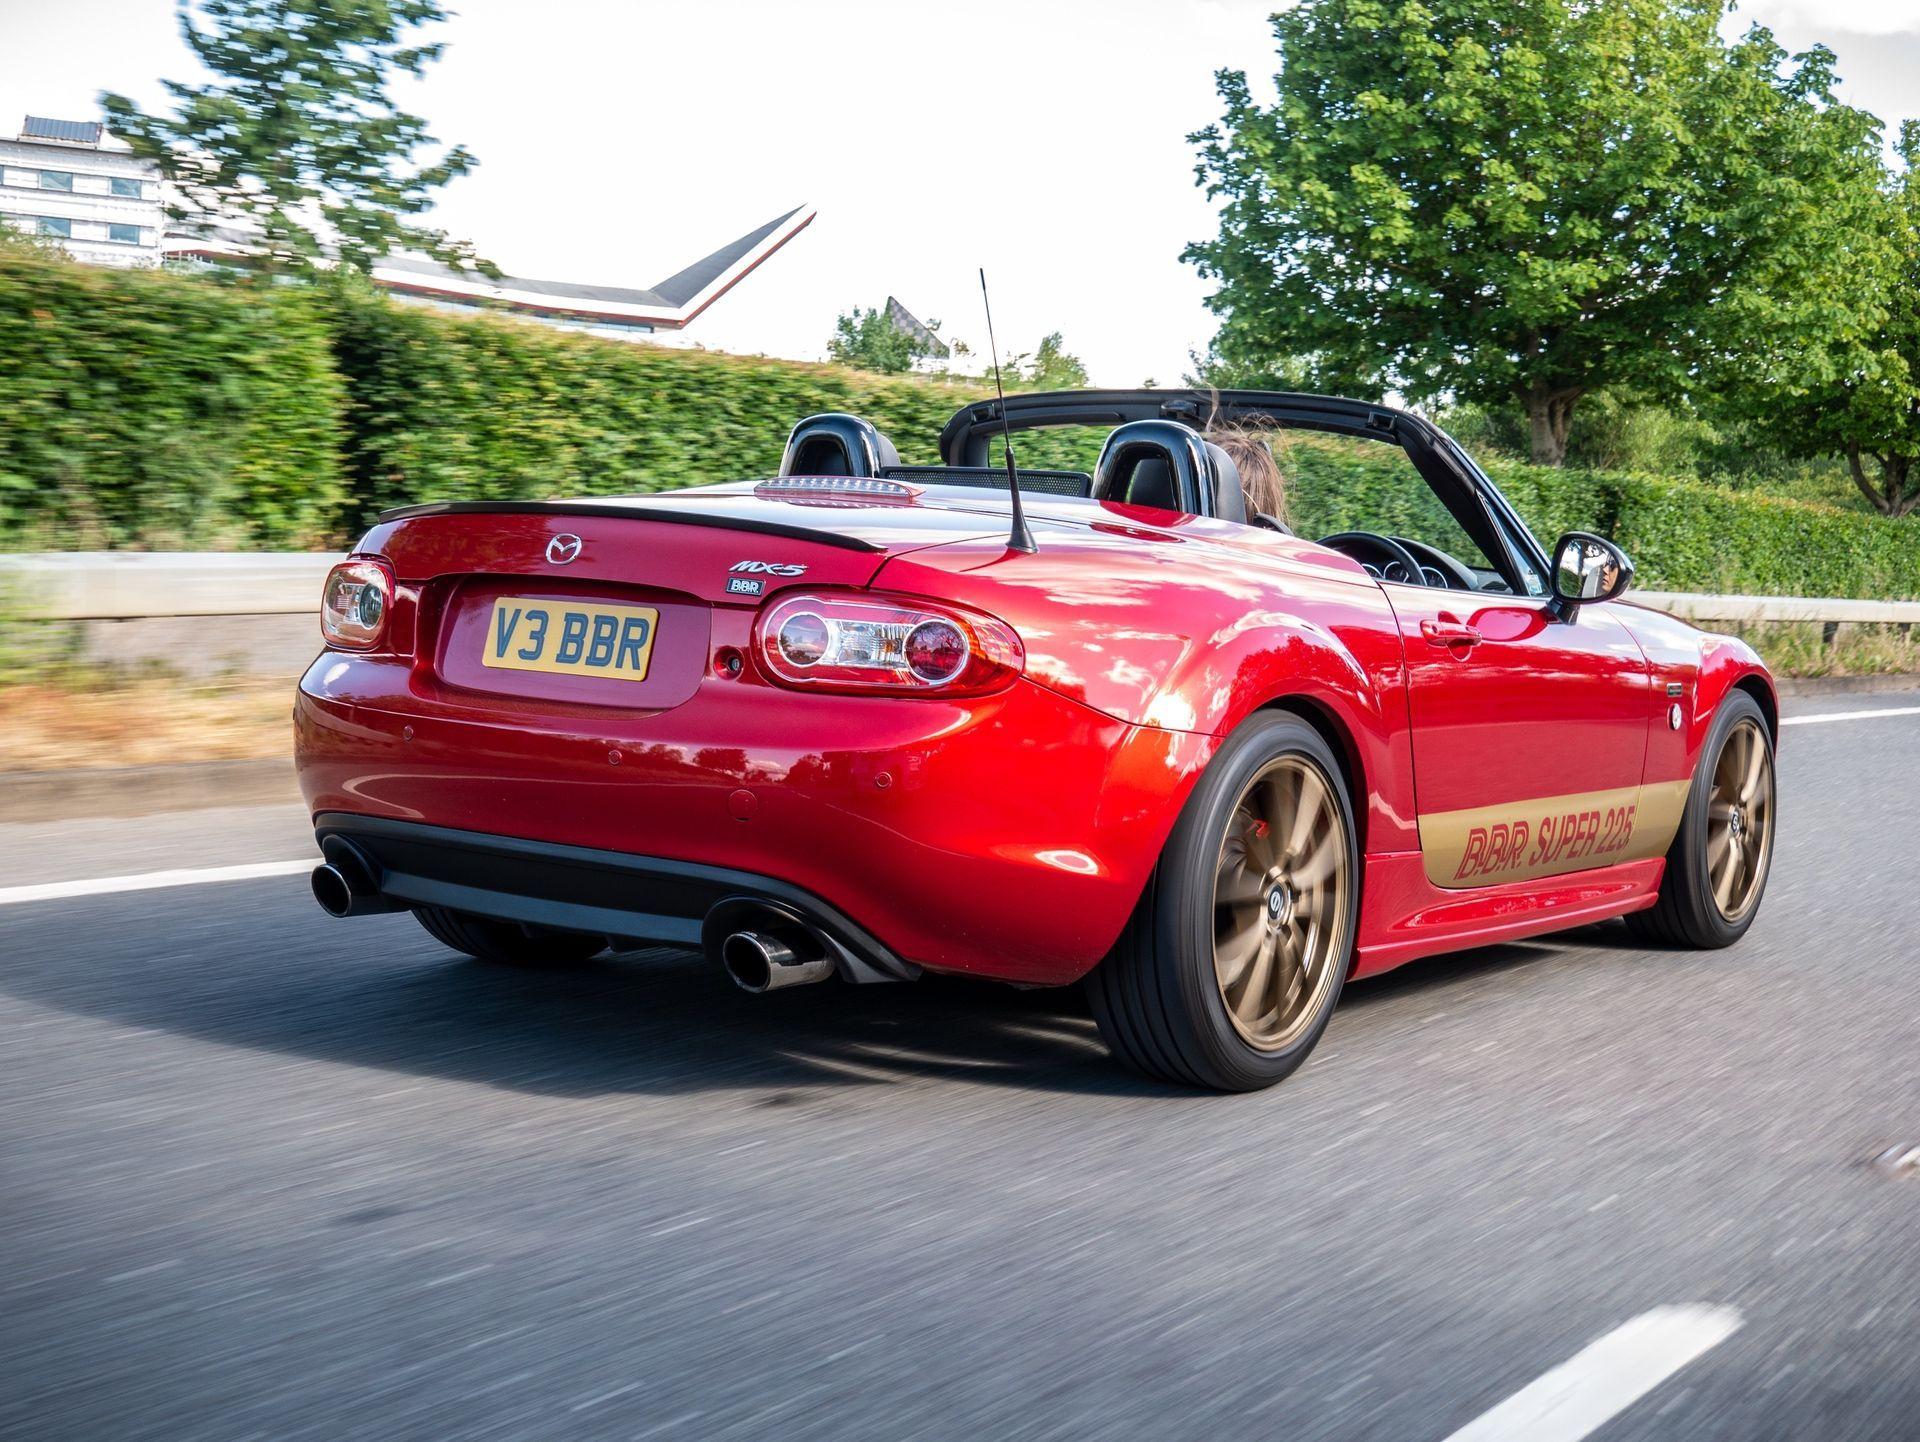 Mazda_MX-5_by_BBR_0004